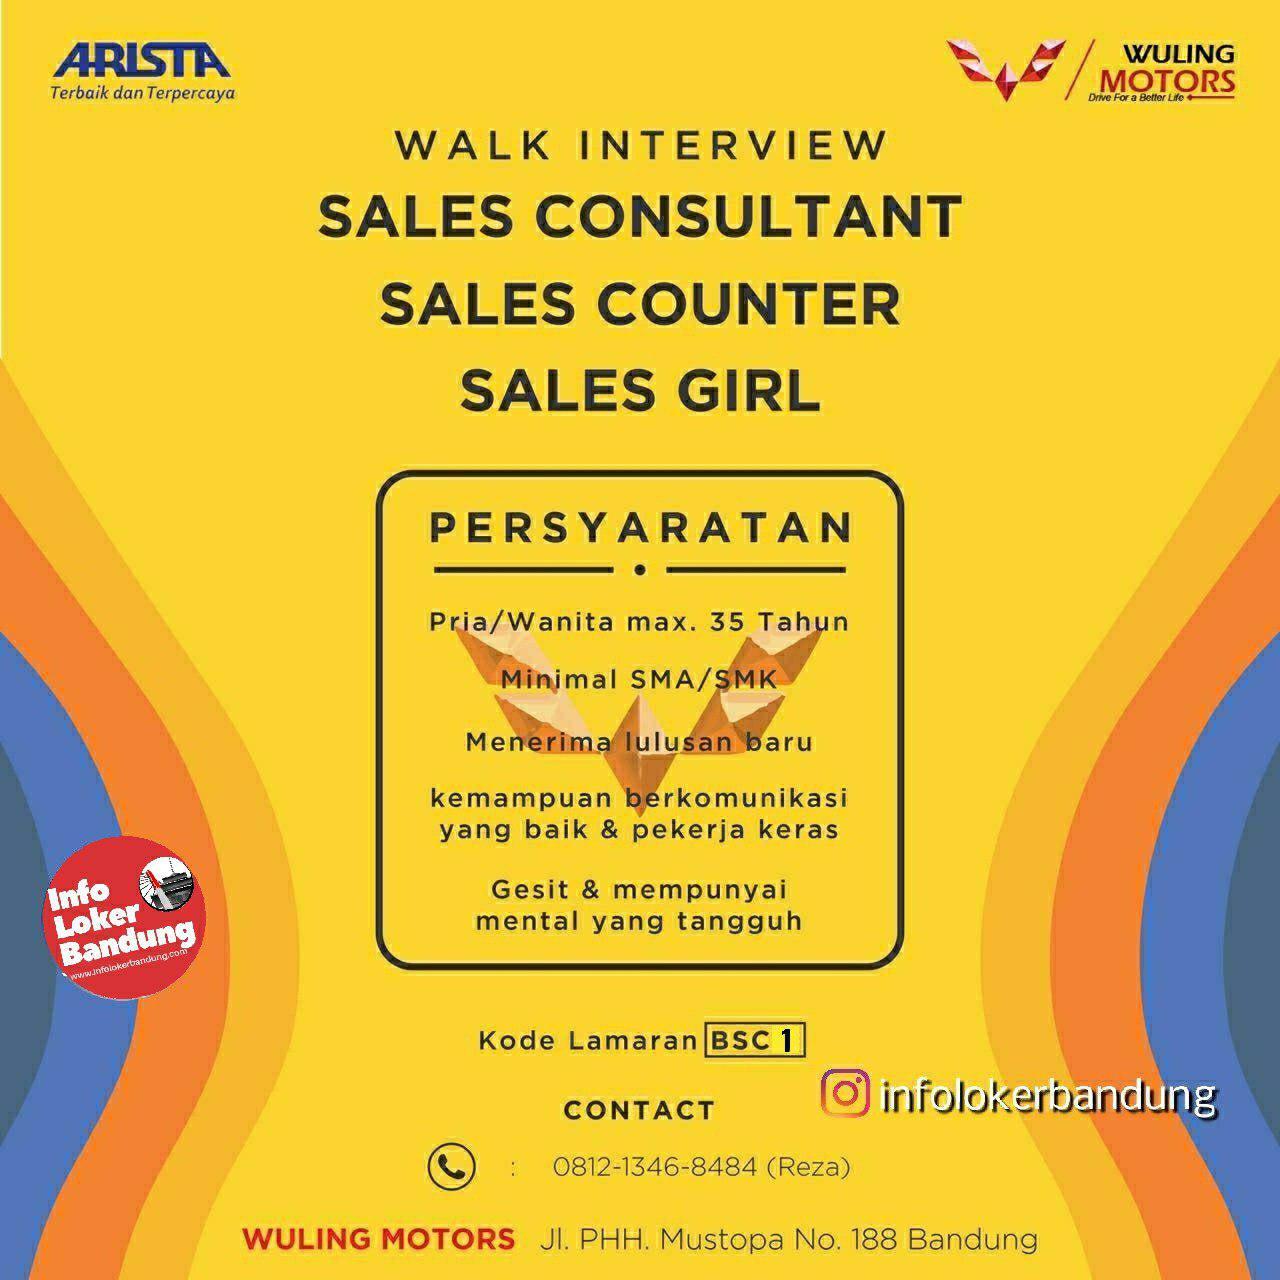 Lowongan Kerja Wuling Motors Bandung ( Walk In Interview ) Bandung Agustus 2019